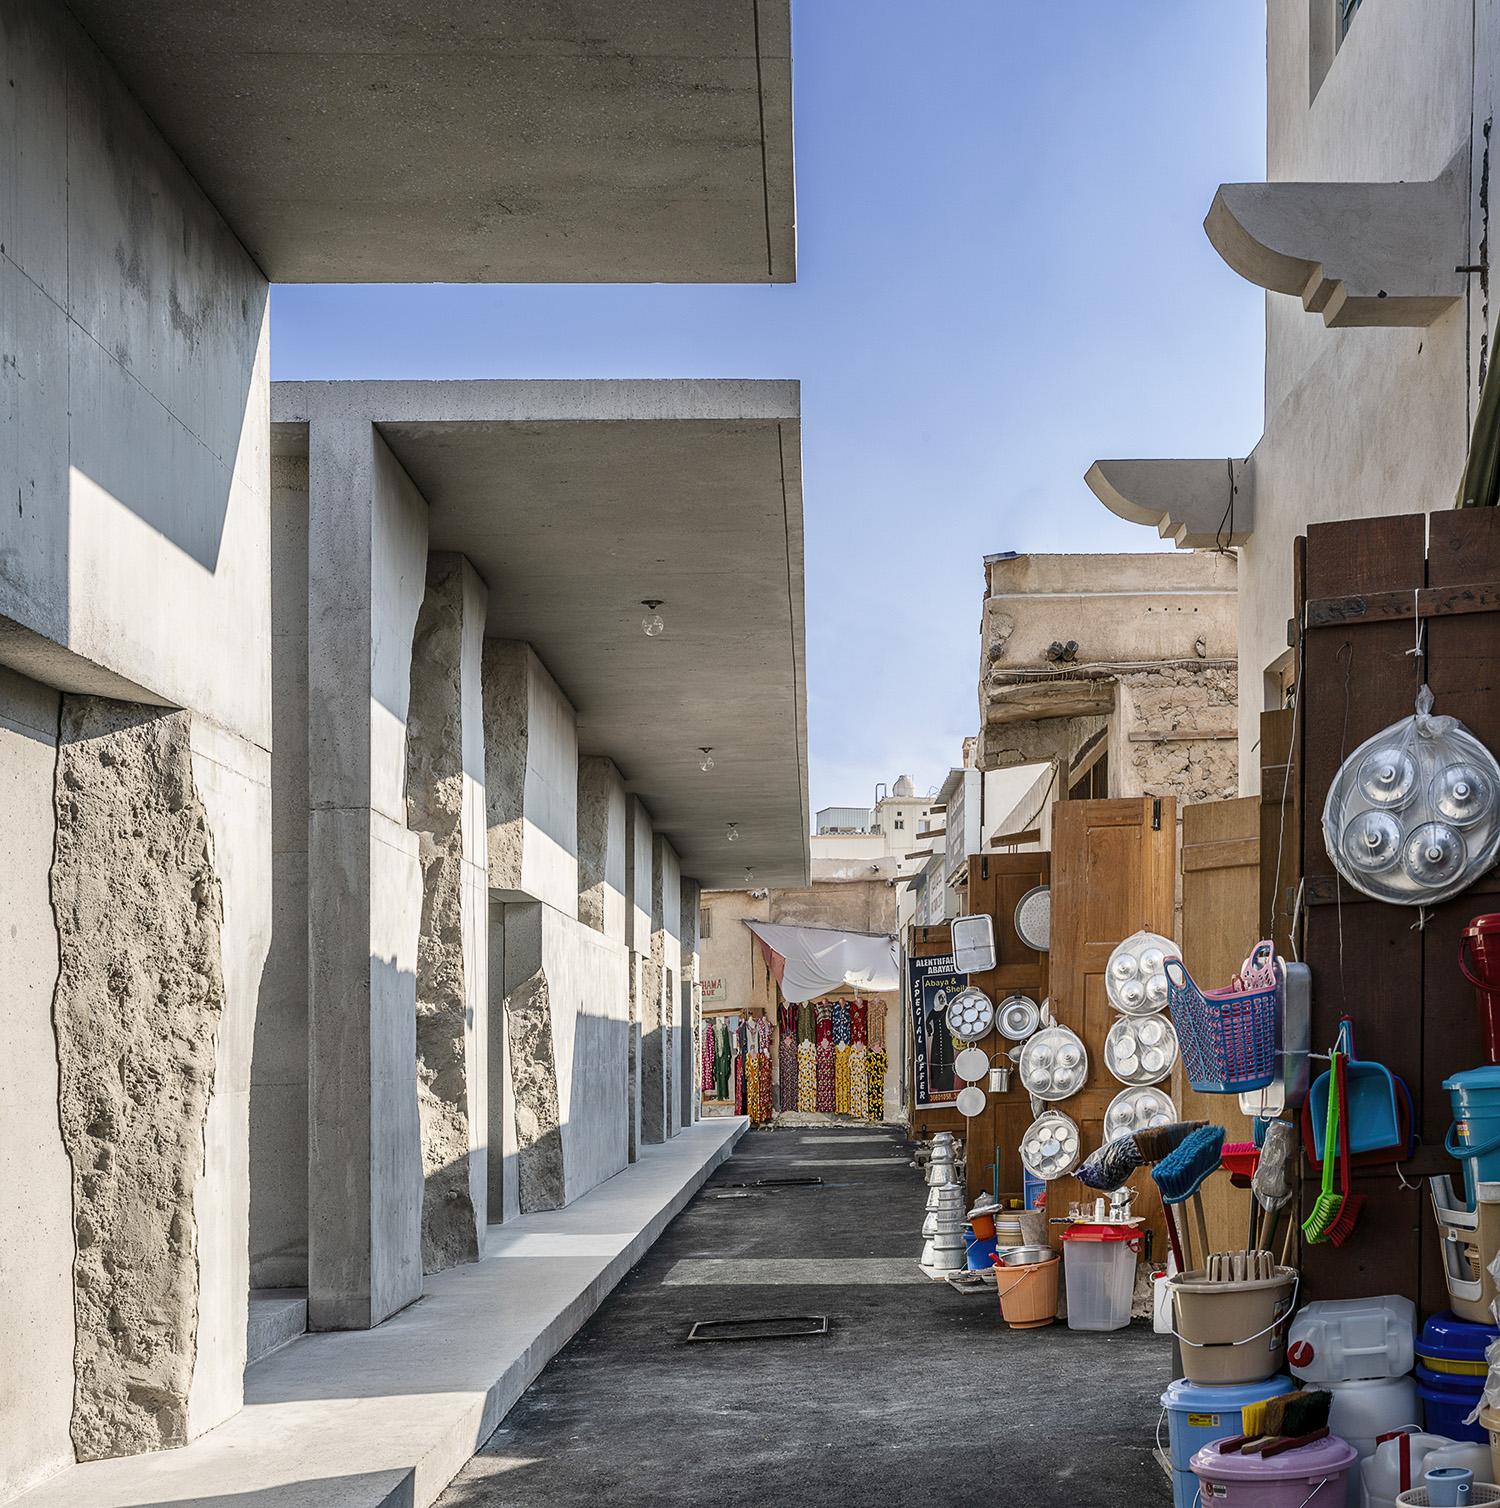 Suq al-Qaysariya in Muharraq, Bahrain.